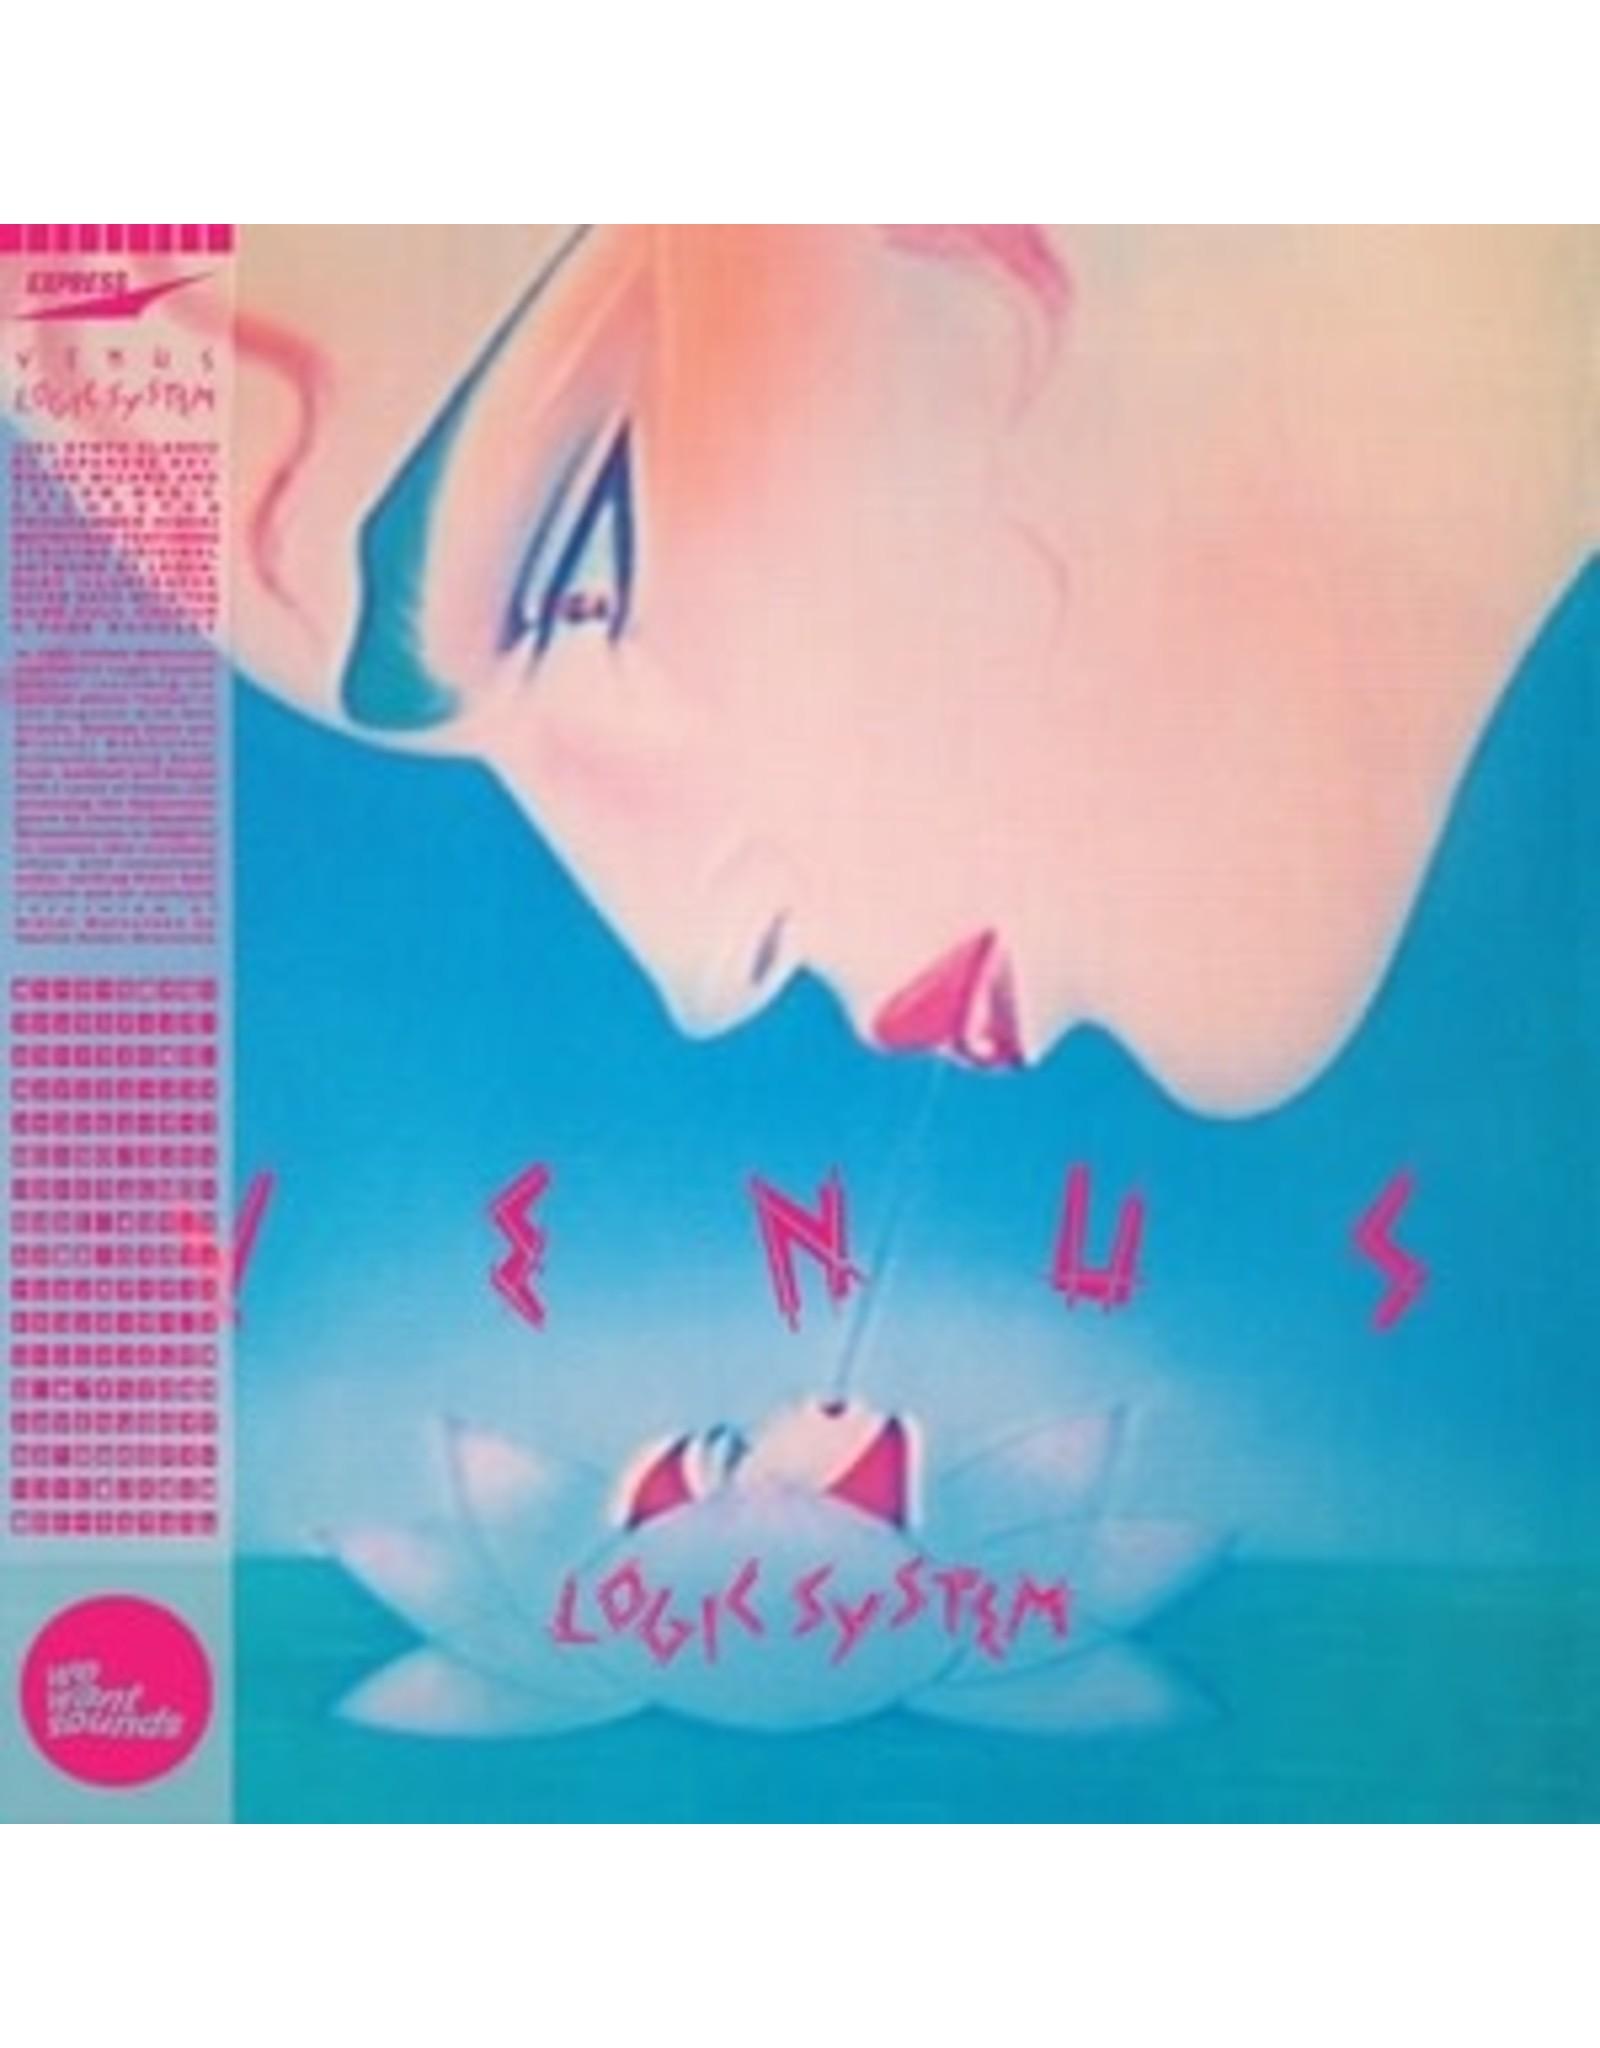 New Vinyl Logic System - Venus LP